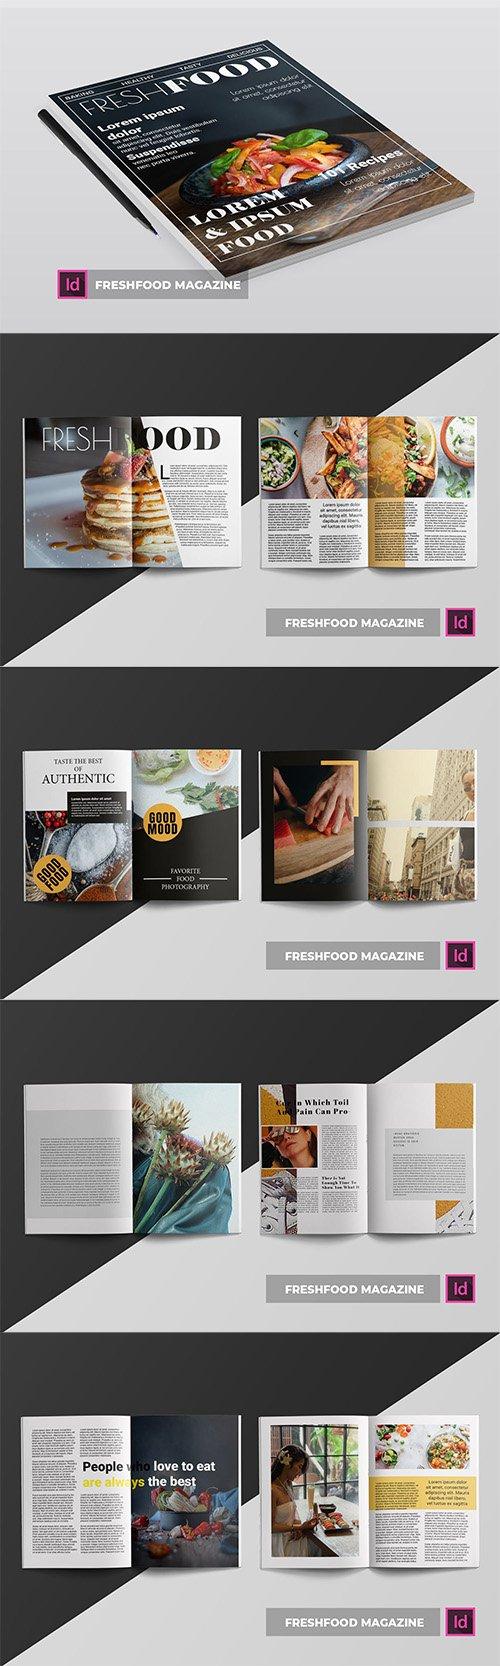 freshfood | Magazine Template